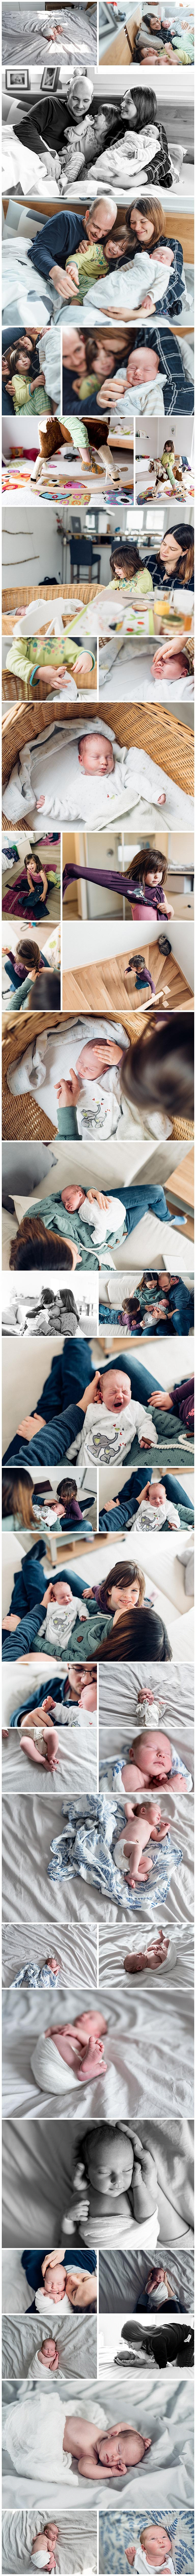 Neugeborenenfotos zuhause Karlsruhe - Lizzily Photographie